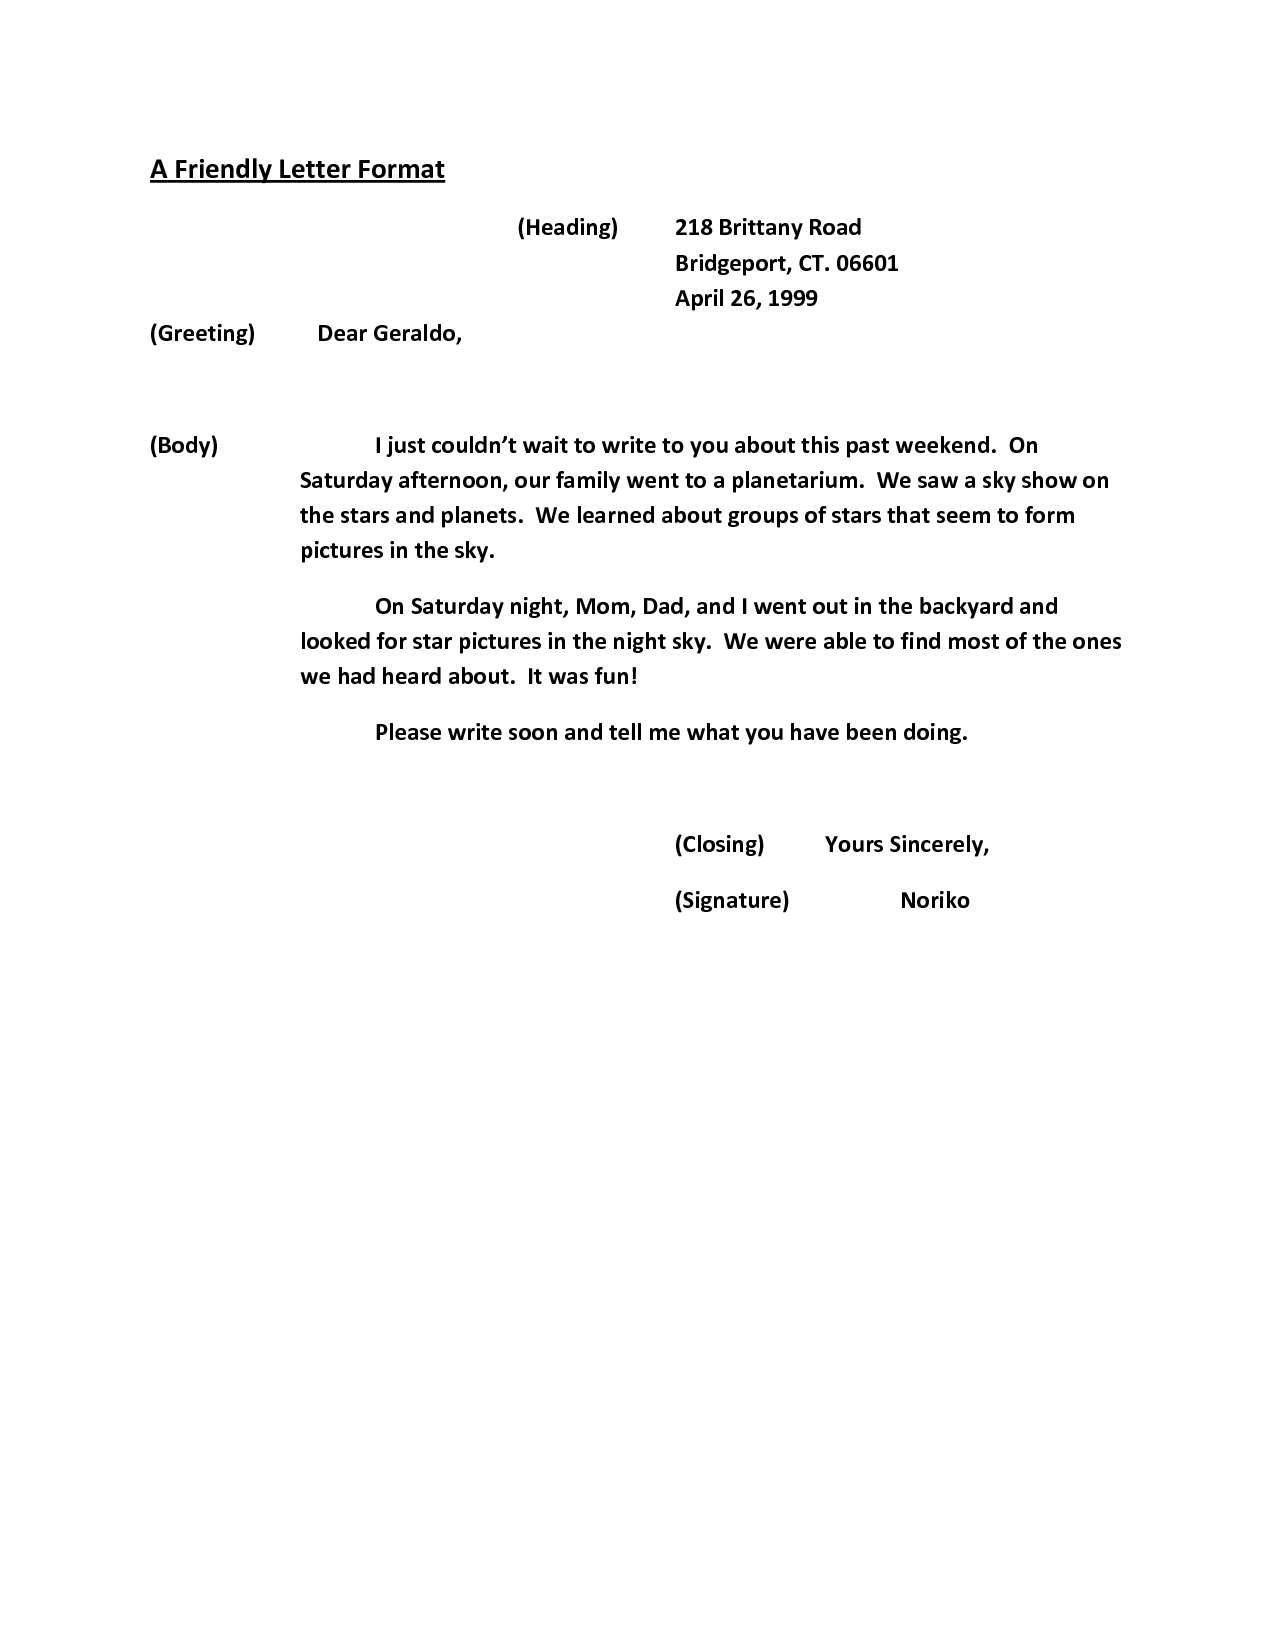 019 Essay Example Friendly Letter Format Mwvacqzf Phenomenal Header Mla Paper Margins Full